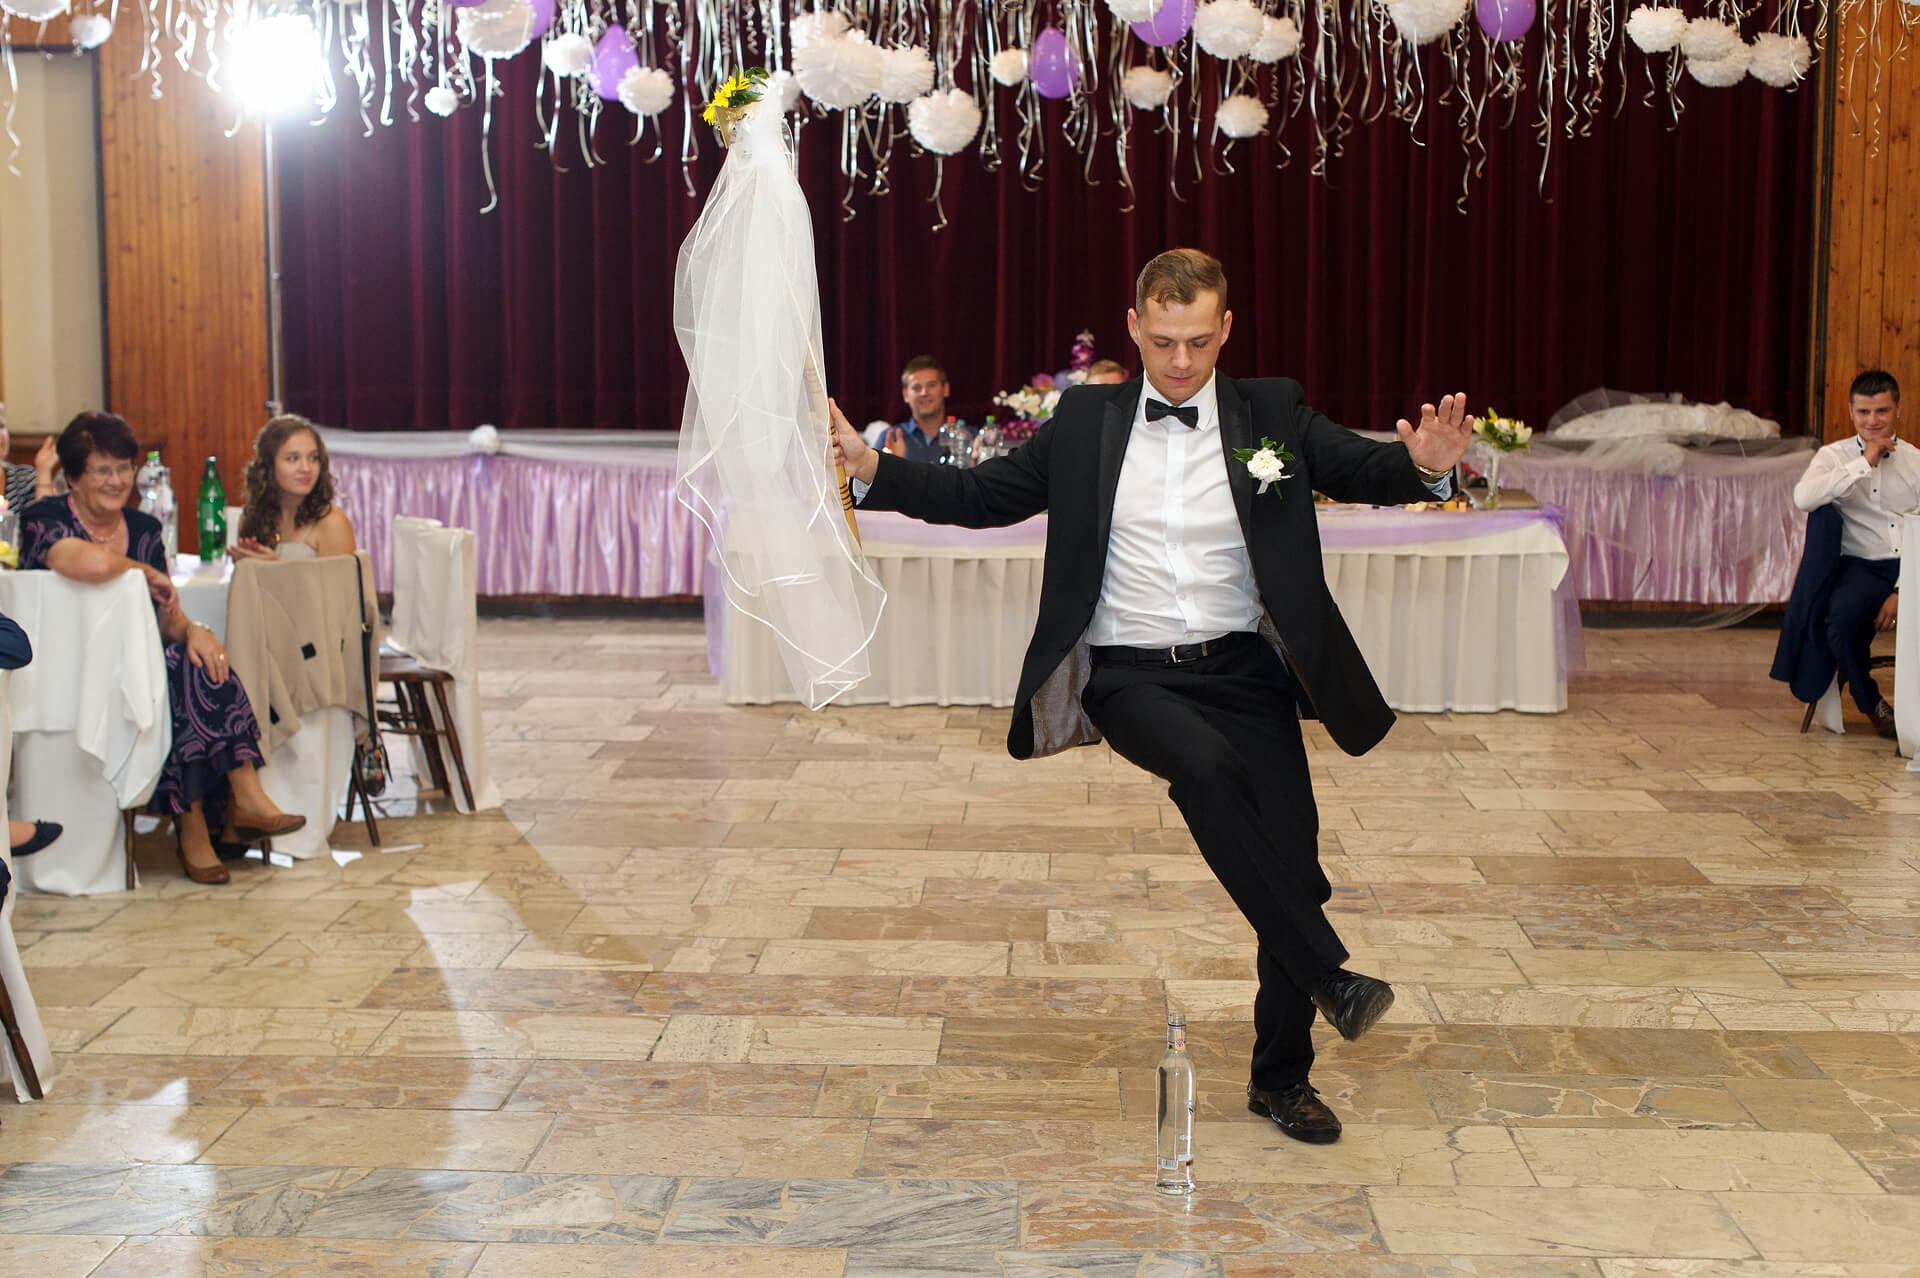 svadba svadobny zabava hostina profesionalne fotenie fotograf Peter Norulak Kosice__08